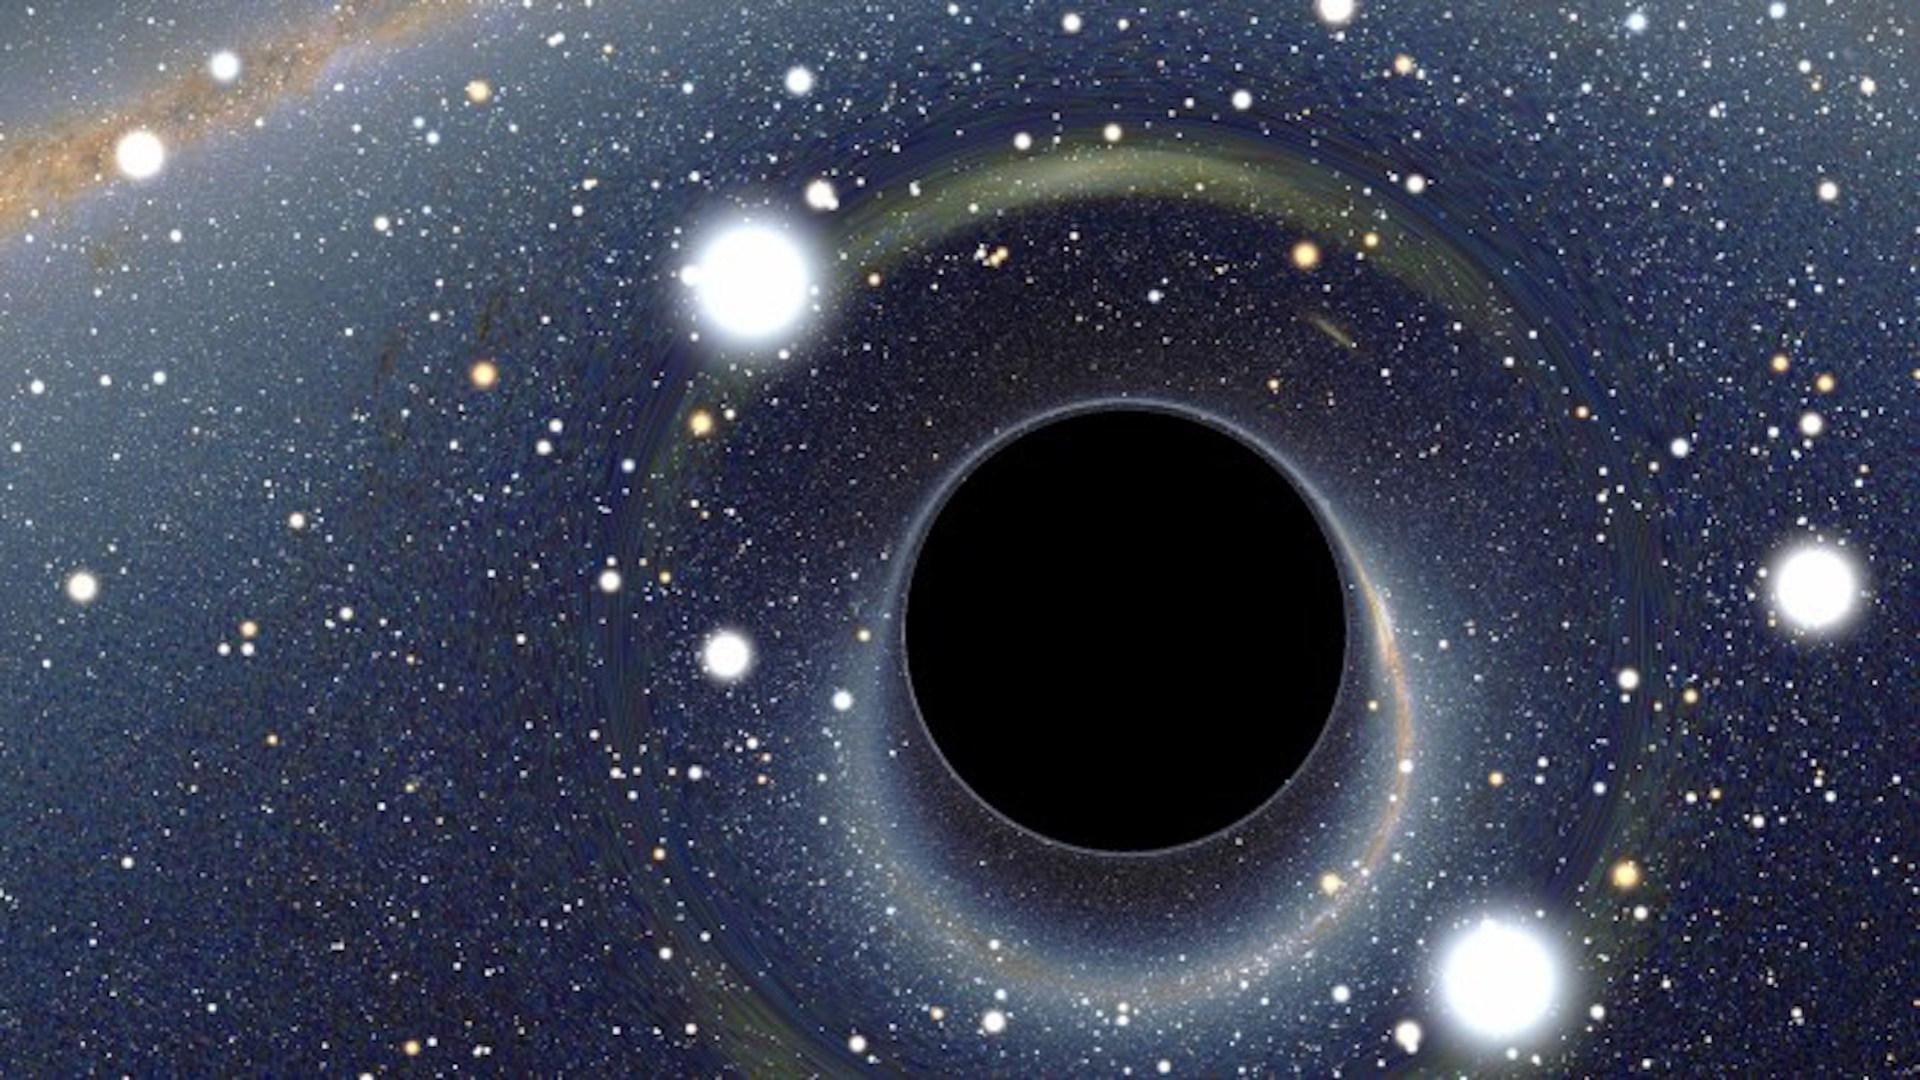 Sonderbares Sonnensystem entdeckt: Der Stern dreht sich falschrum - WinFuture